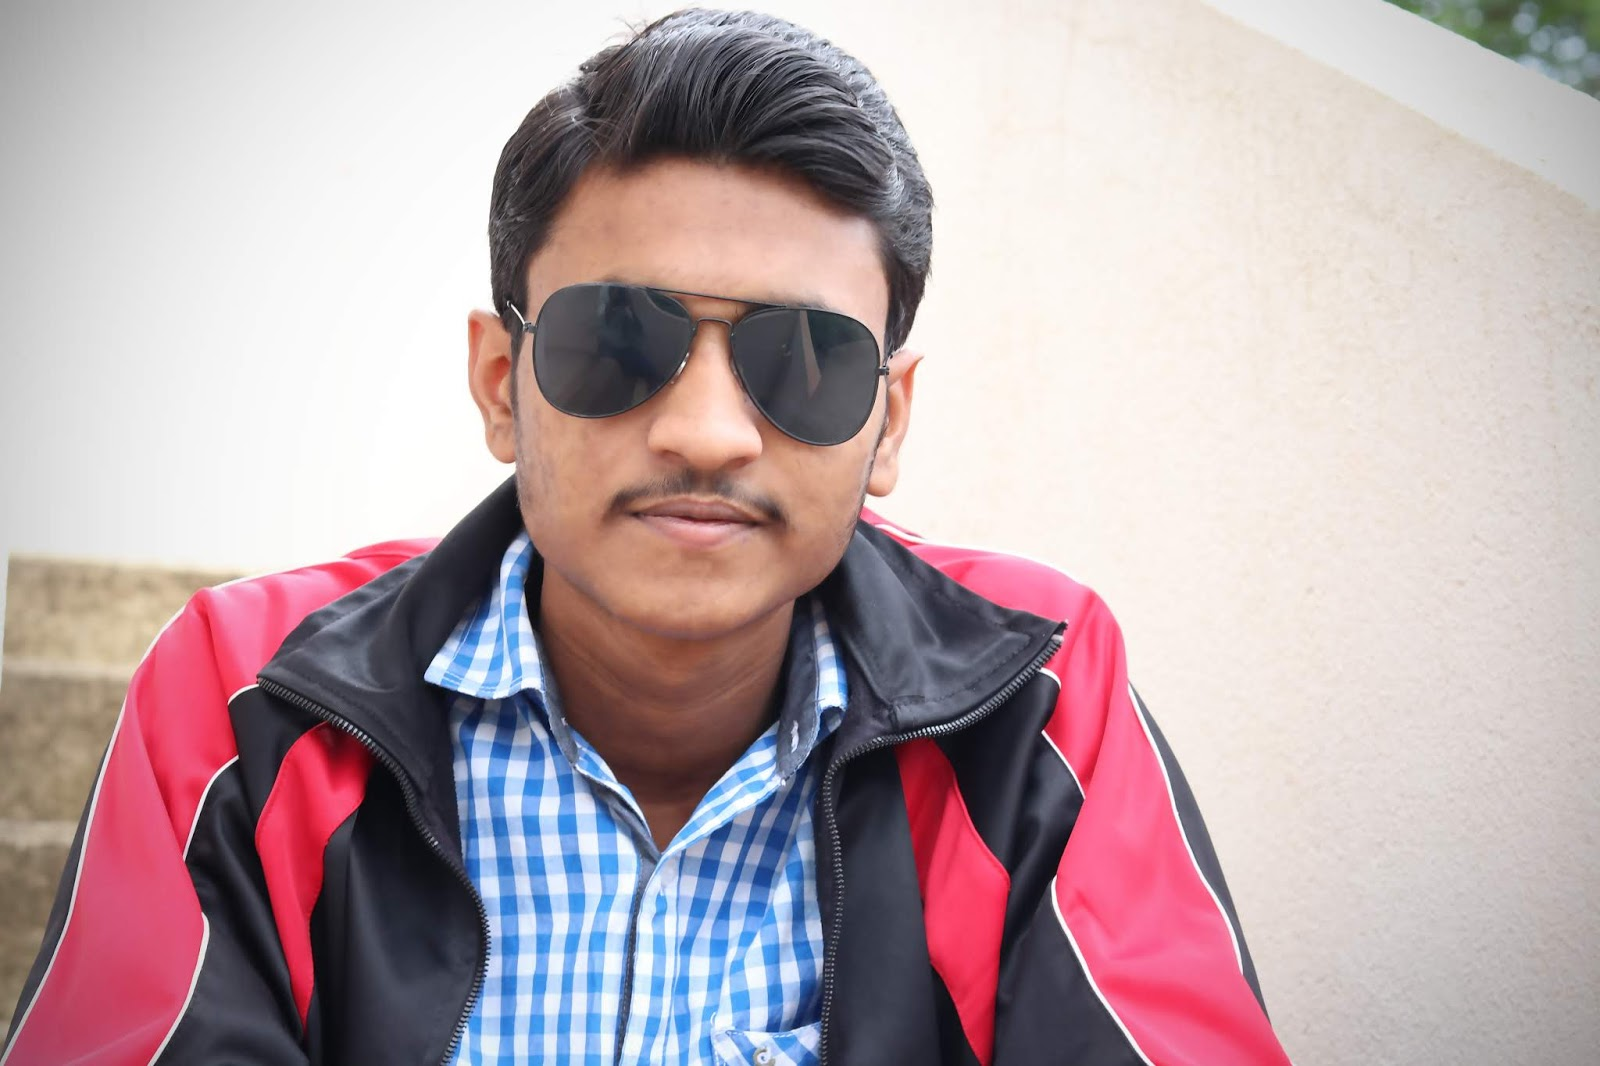 Outdoor Photo Shoot of Shrikant R G - RCs Clicks